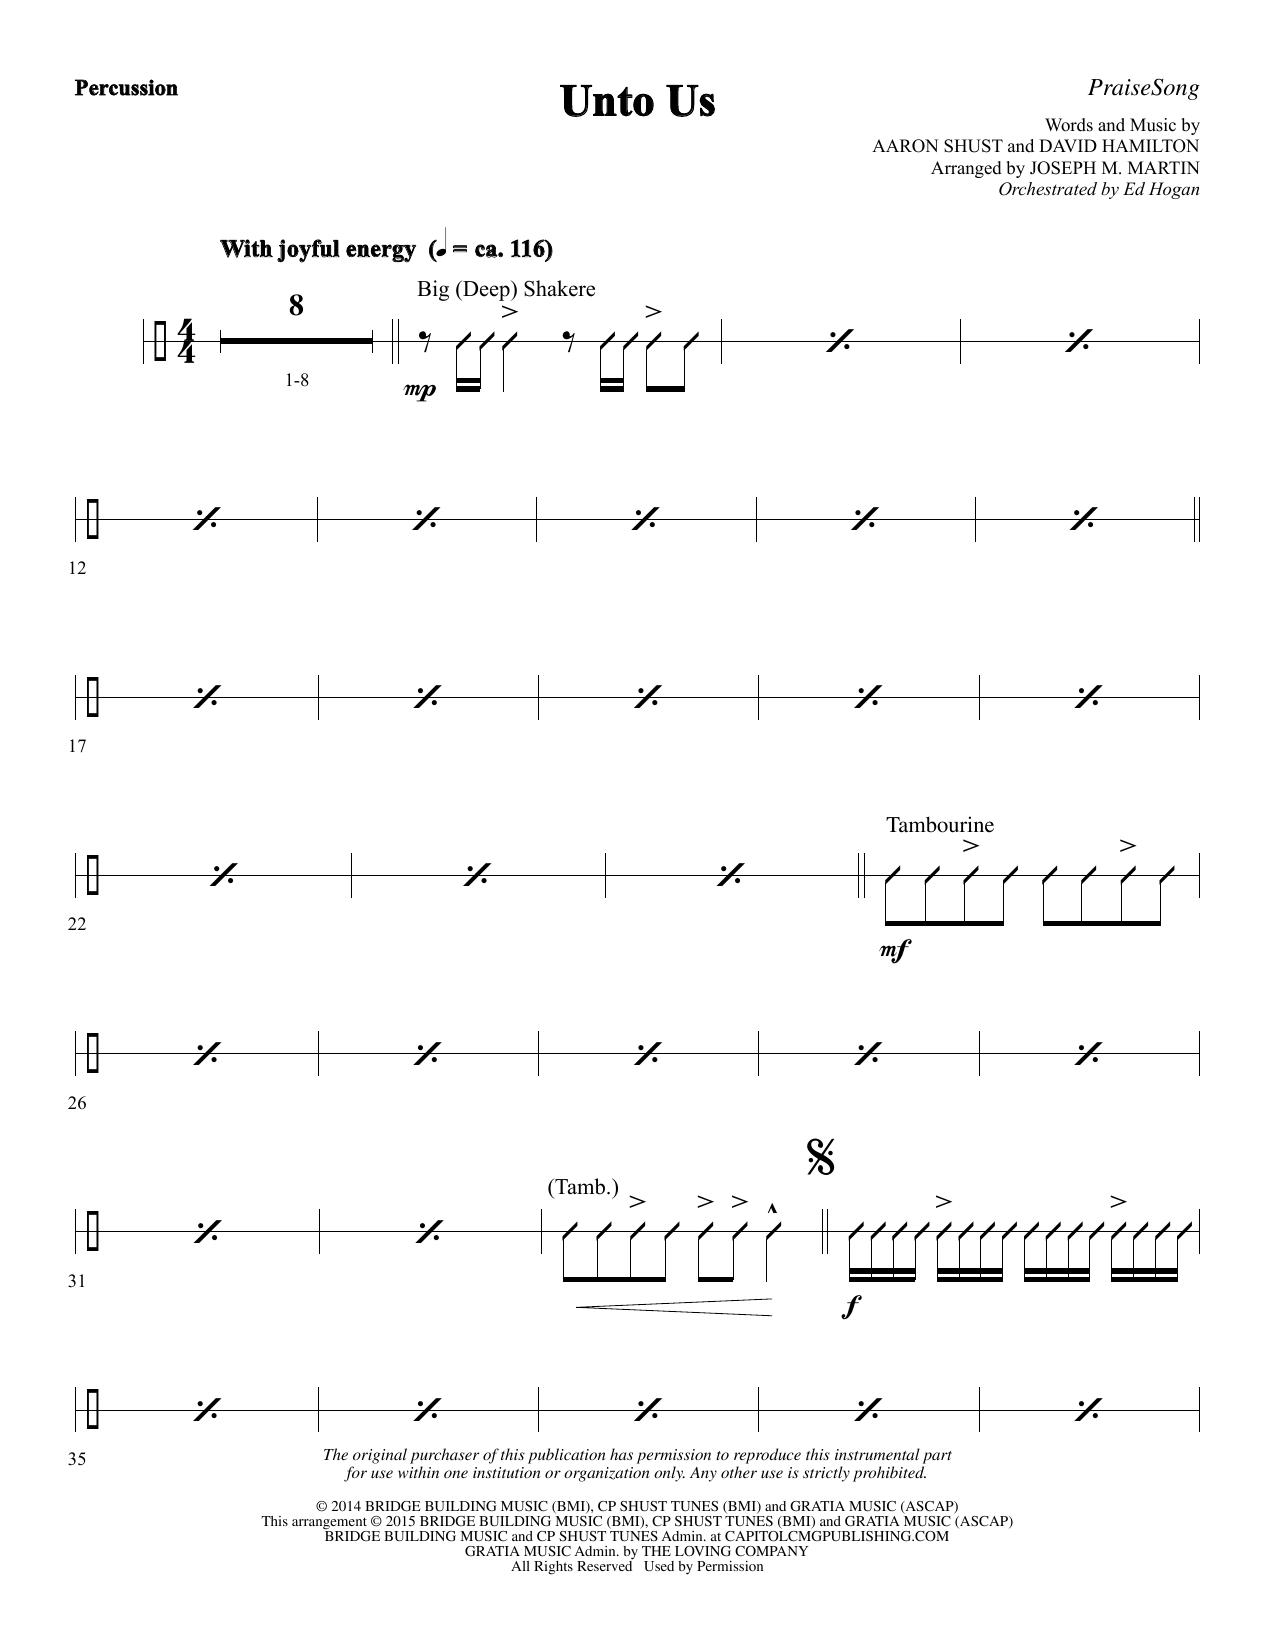 Unto Us - Percussion Sheet Music